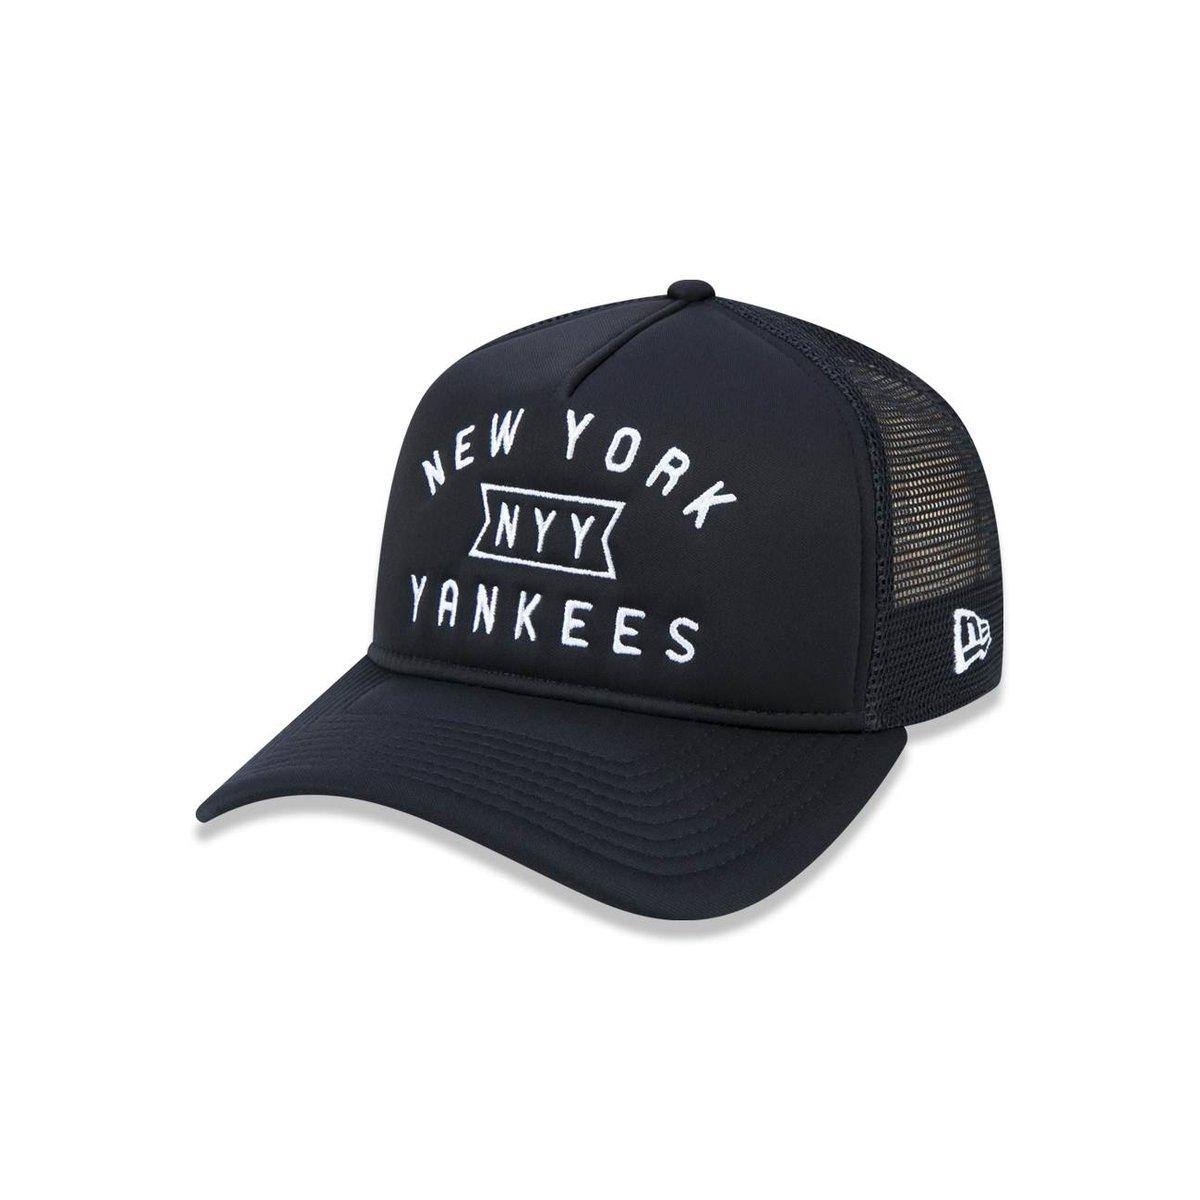 784ba29b31fc8 Boné 940 A-frame New York Yankees MLB Aba Curva New Era - Preto - Compre  Agora